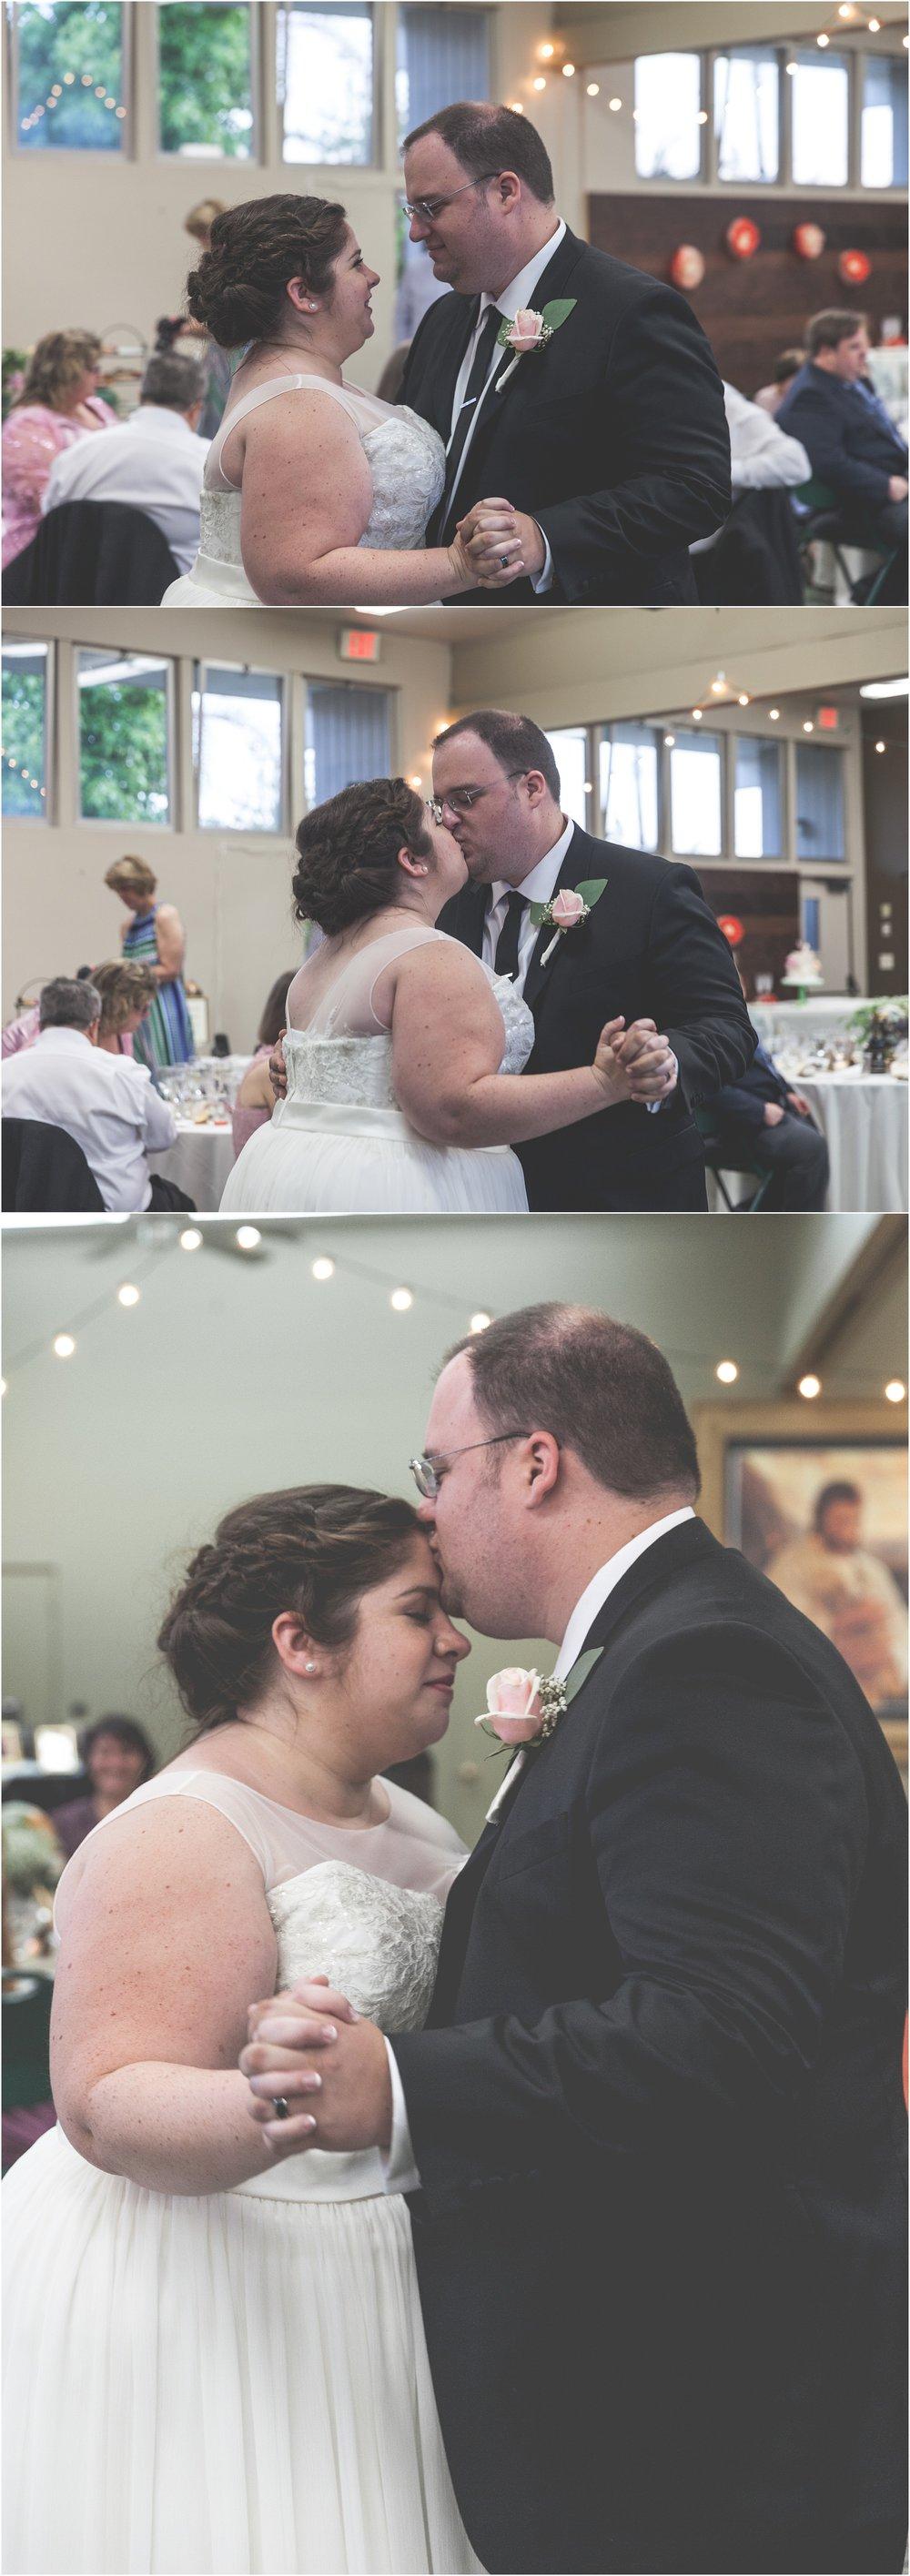 Lindsey & David Wedding Stomps 43.jpg